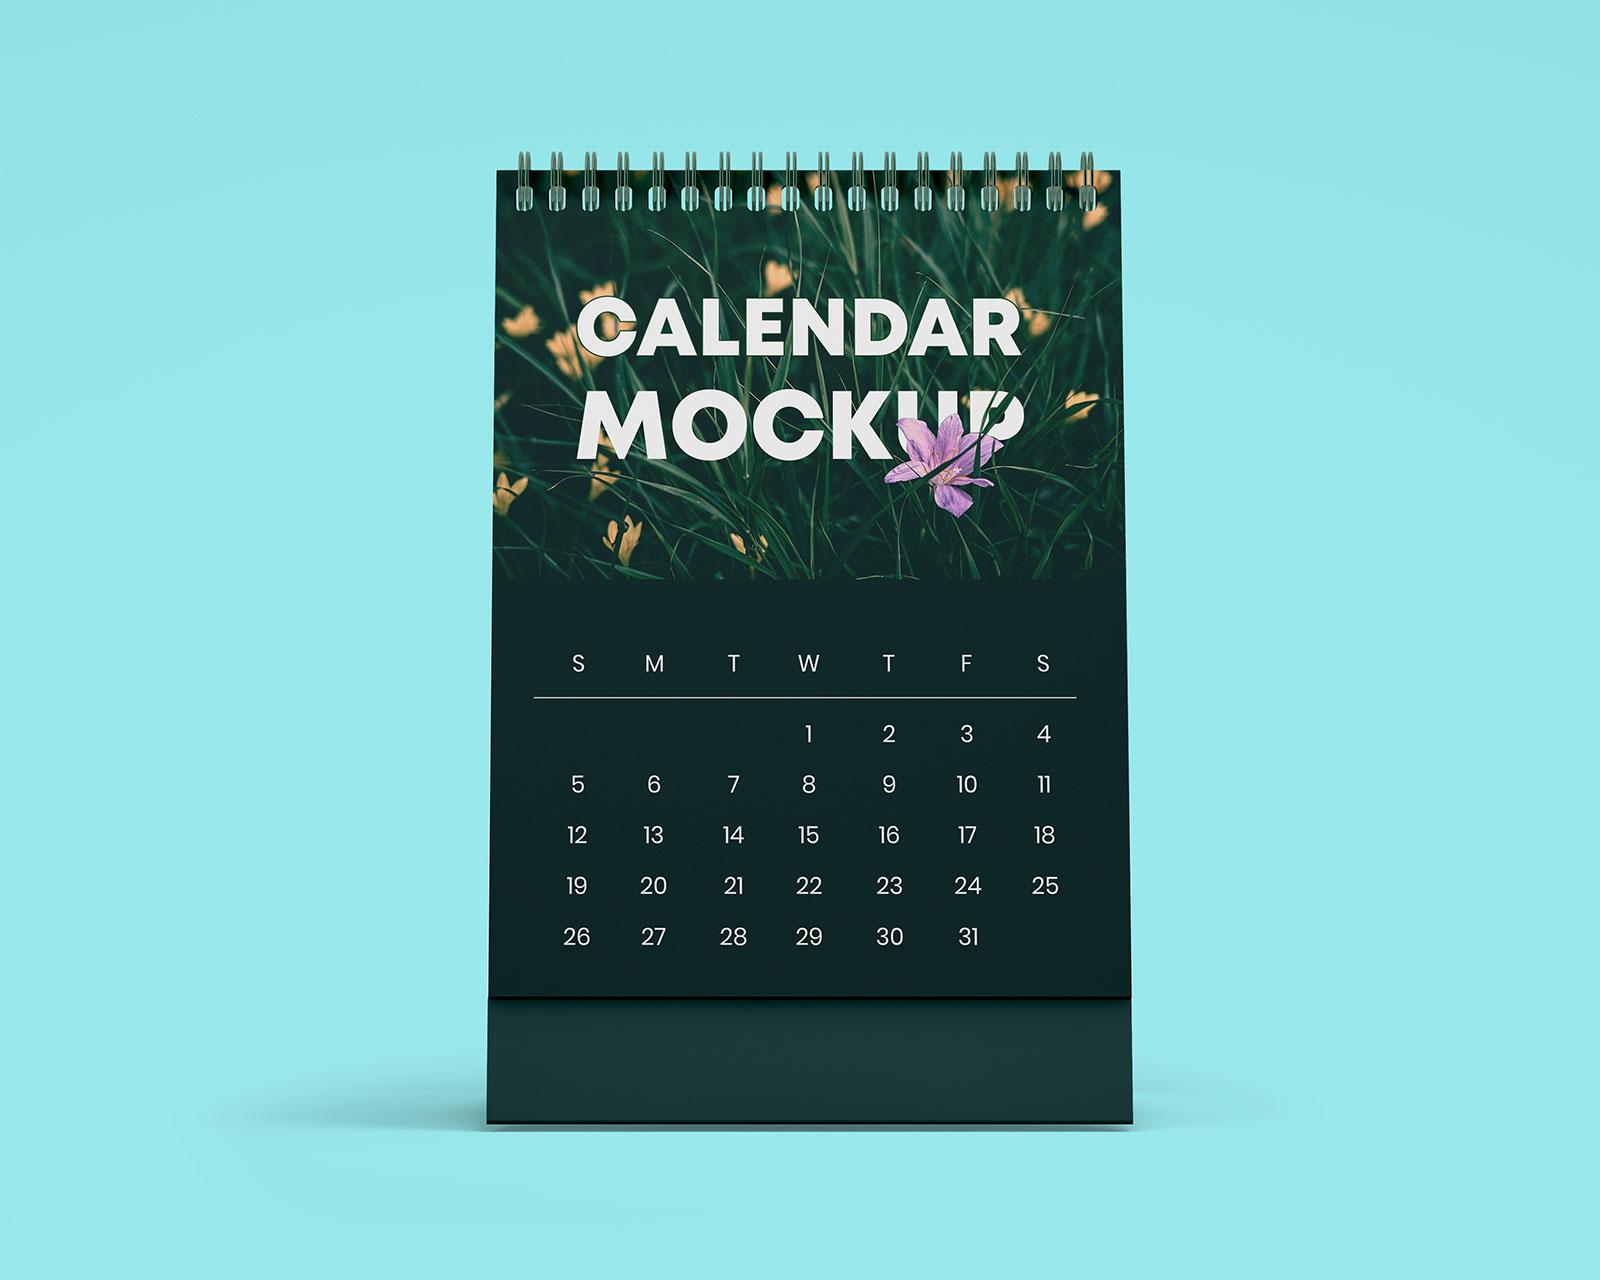 Free-Table-Office-Desk-Tent-Calendar-Mockup-PSD-Set-2